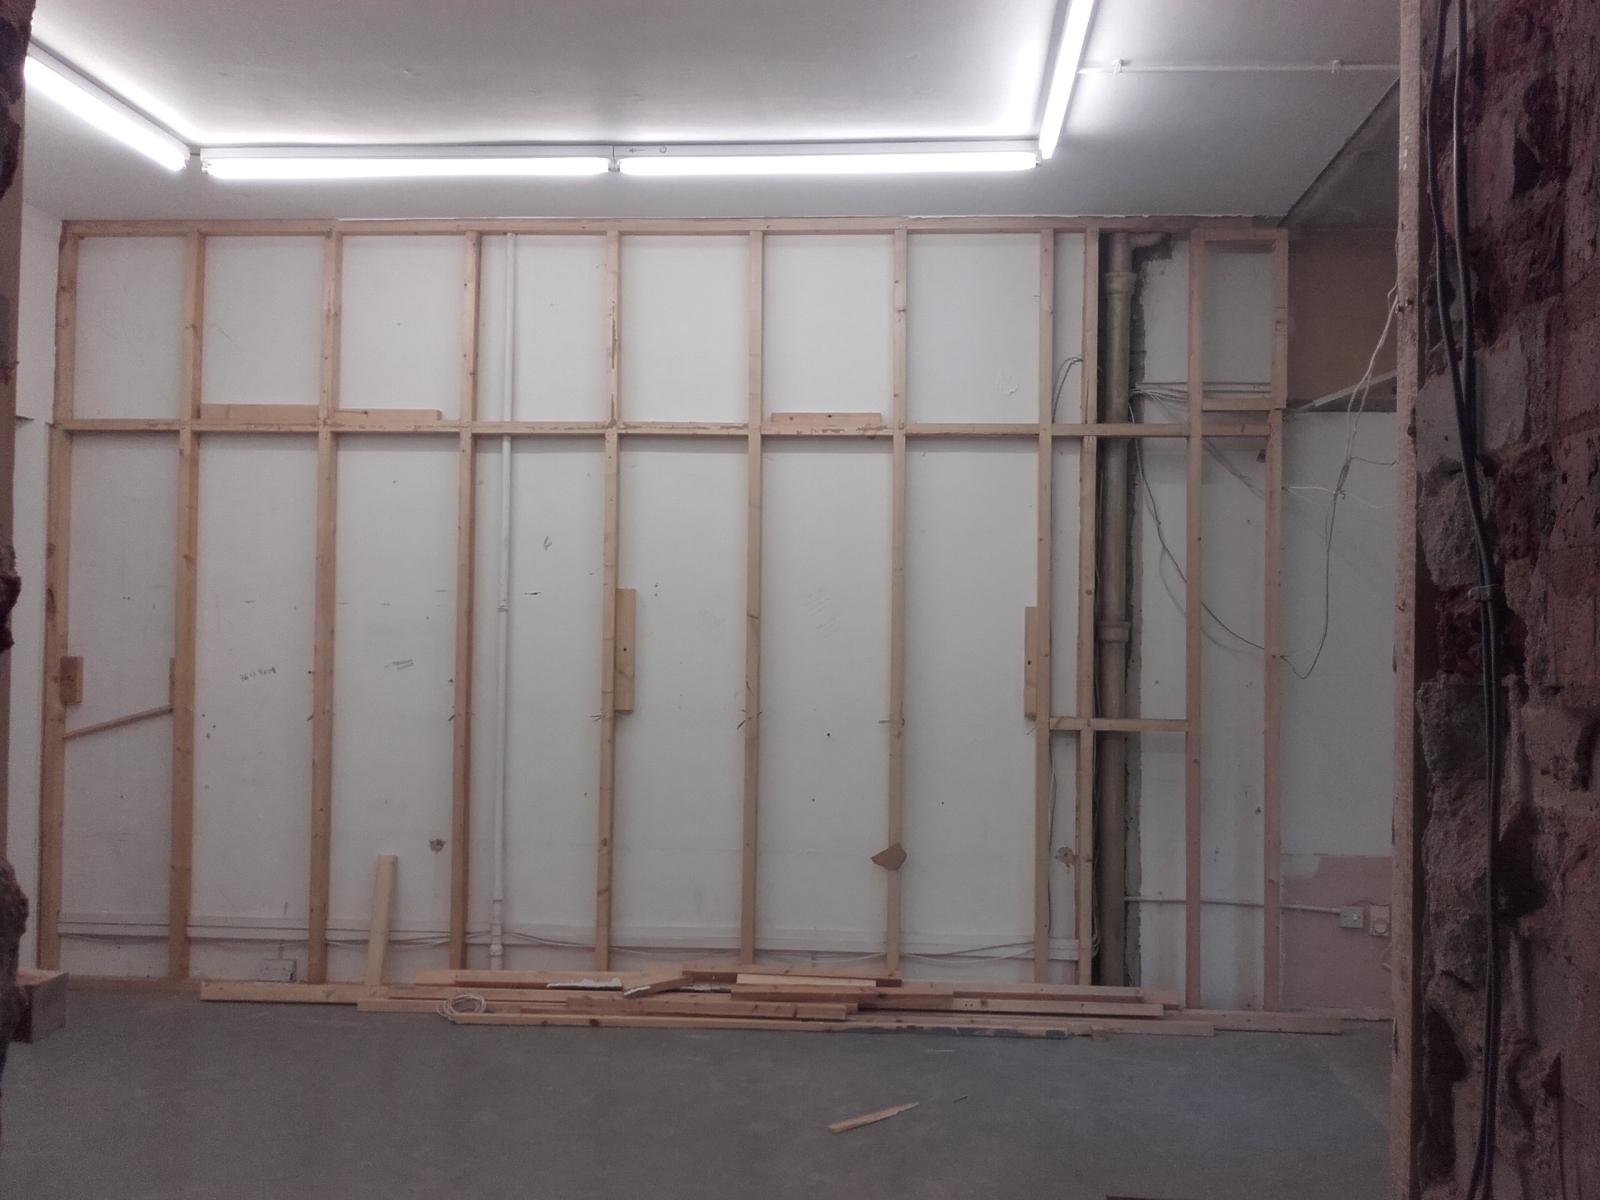 Gallery wall stripped.jpg